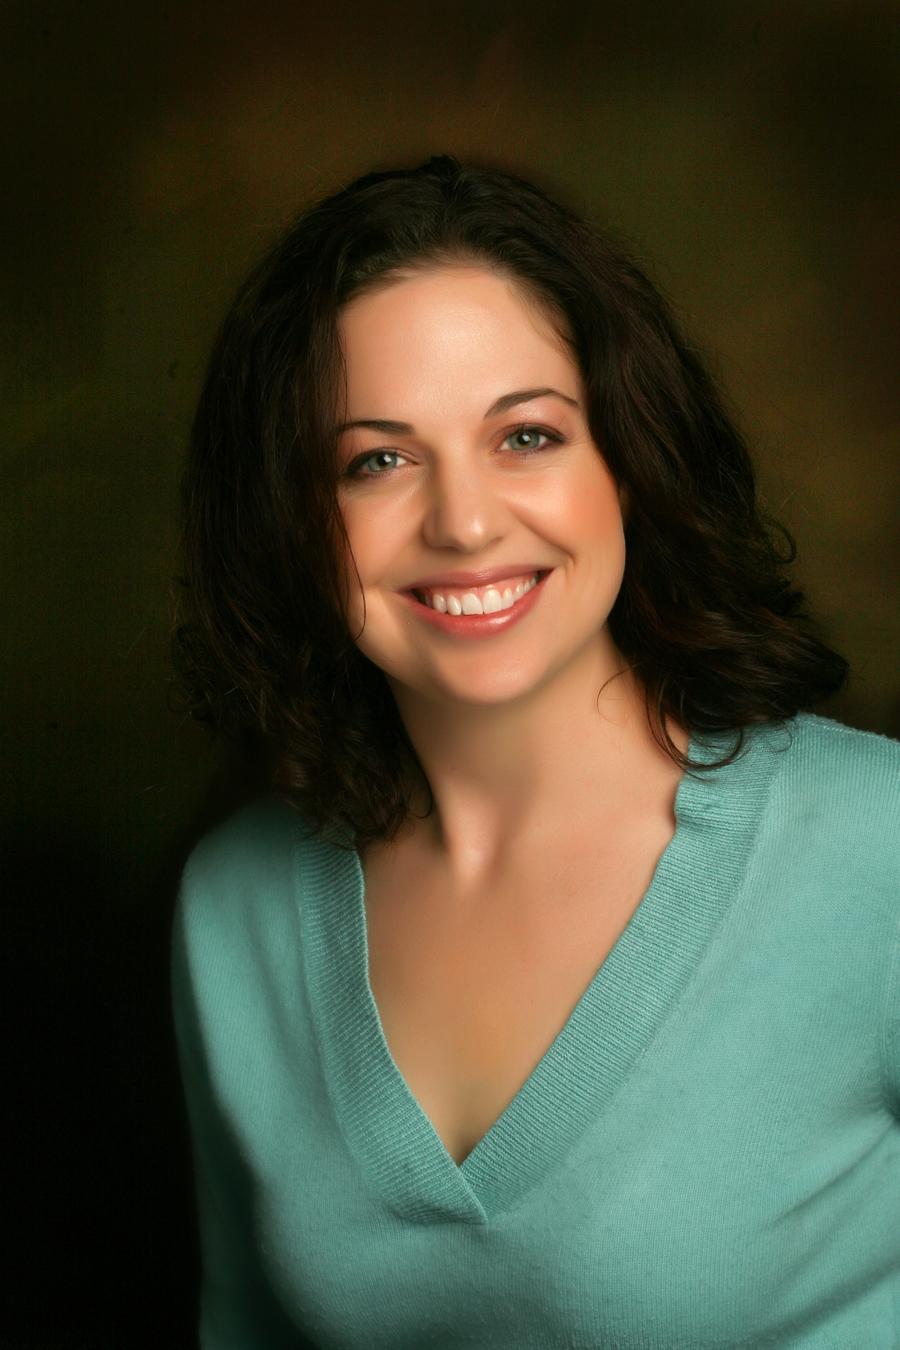 Amanda Spanbauer